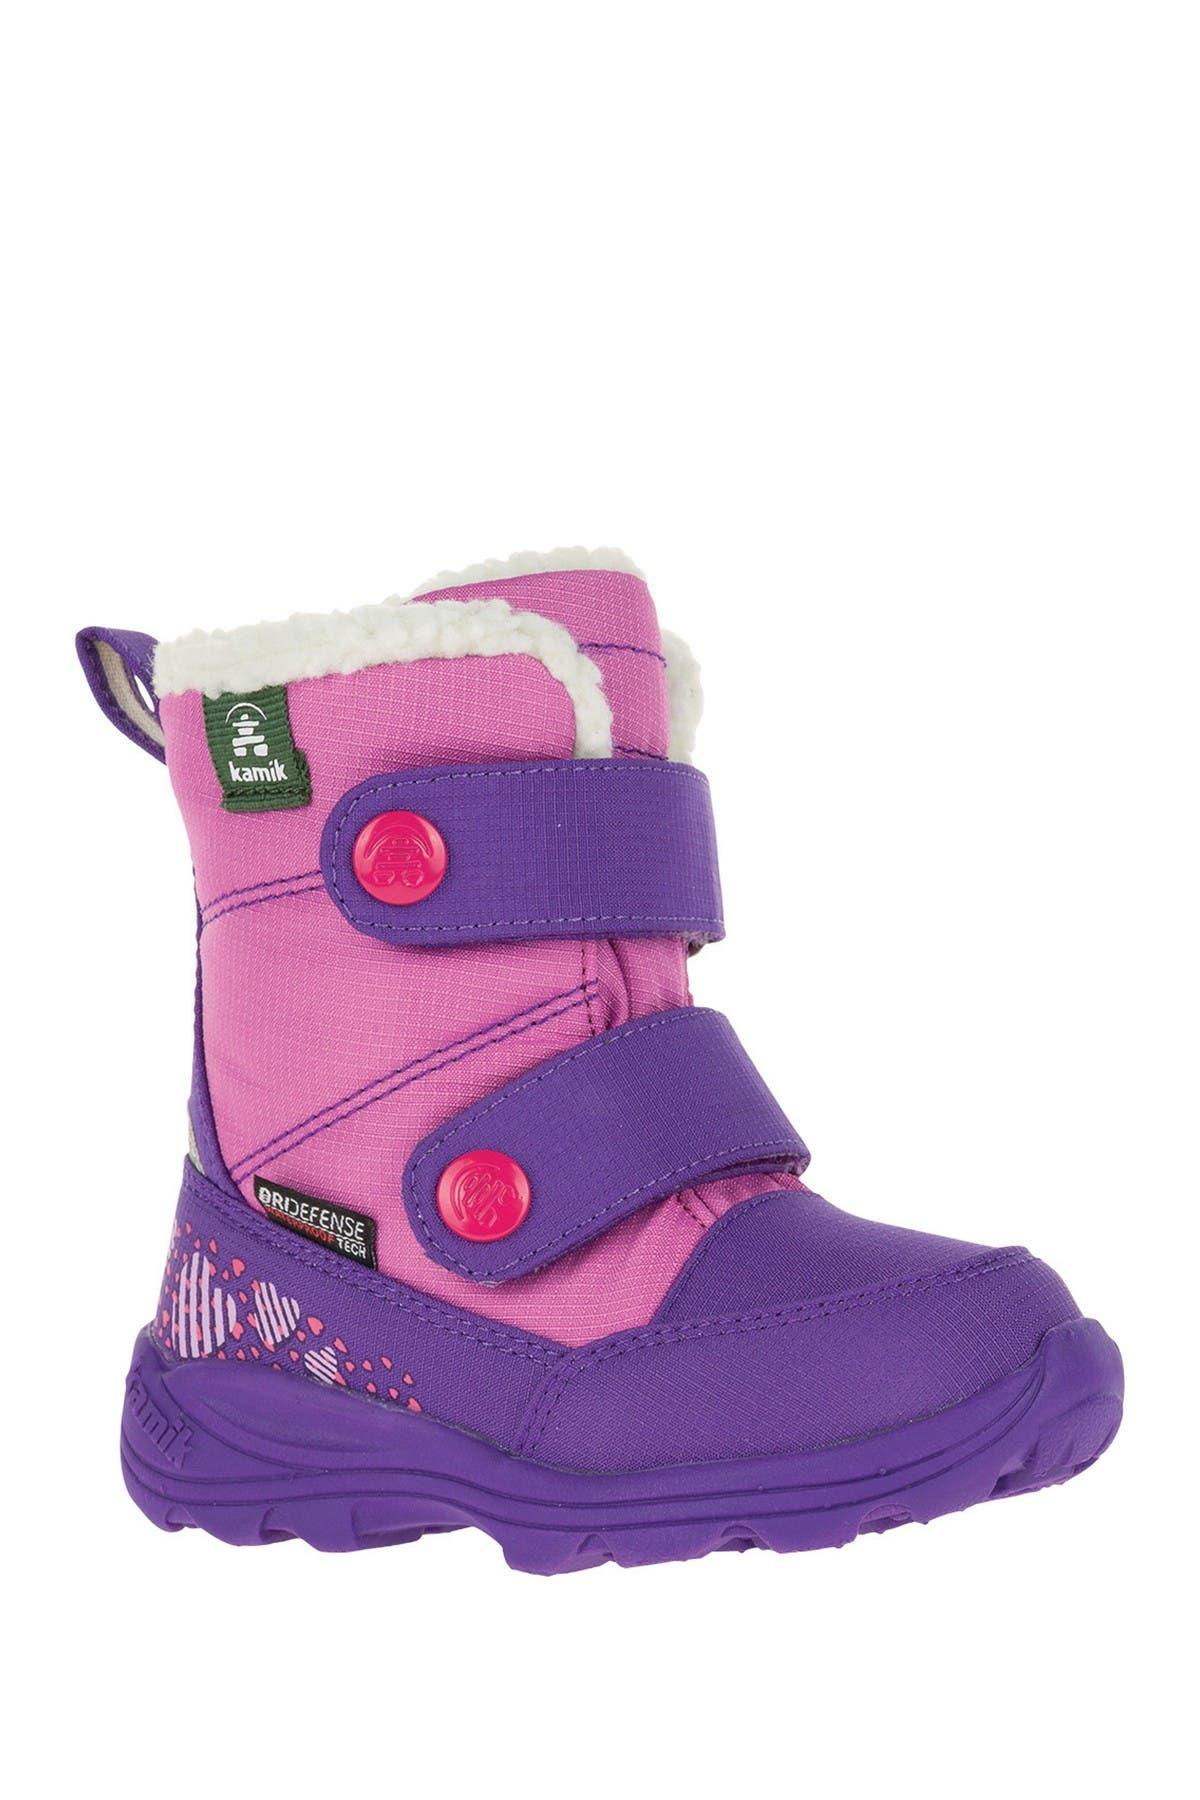 Image of Kamik Pep Waterproof Boot